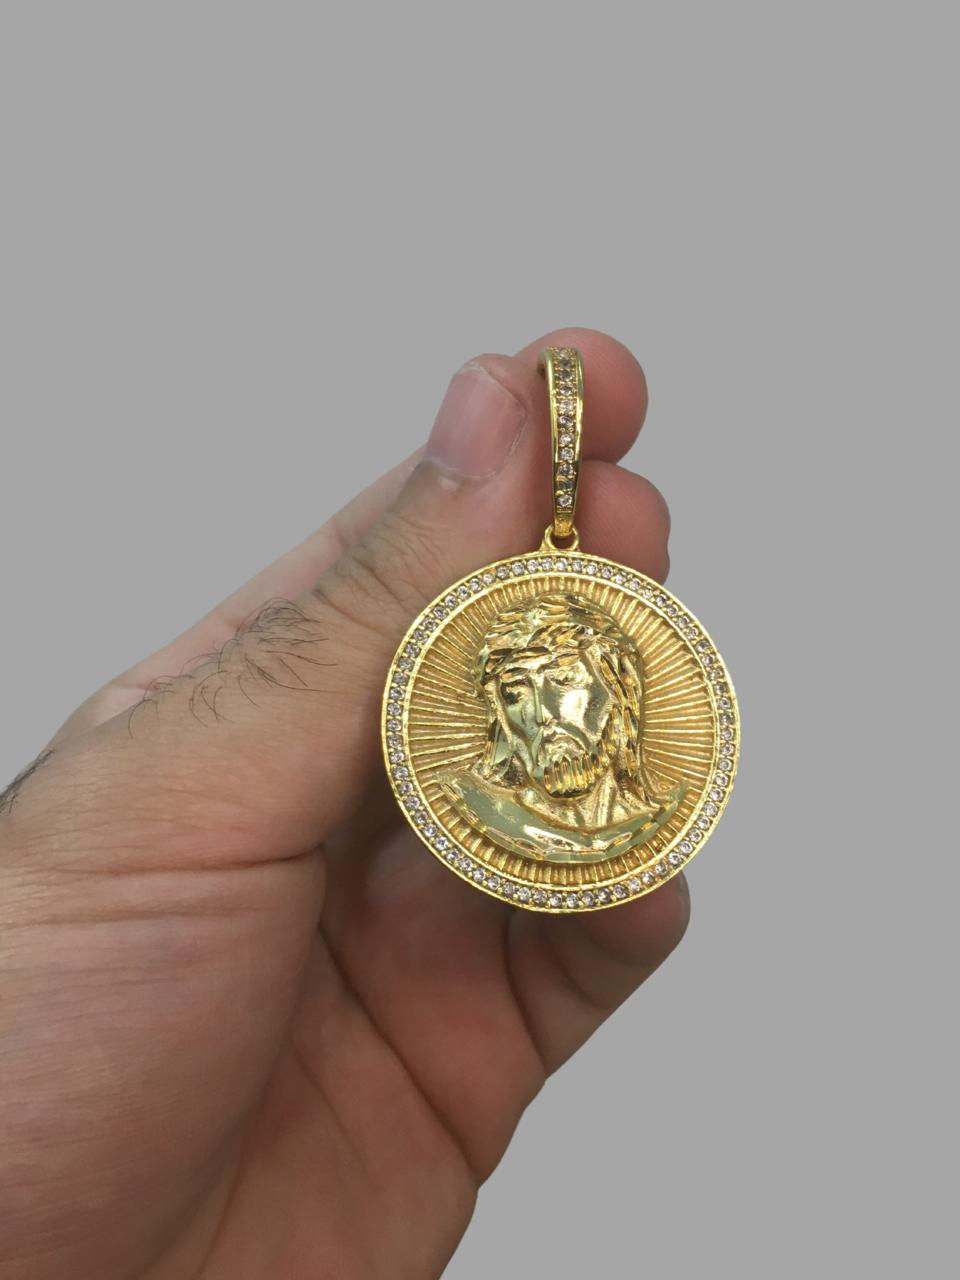 Pingente  Redondo Cravejado de zircônia na borda e face de Jesus Cristo -   banhado a ouro 18k